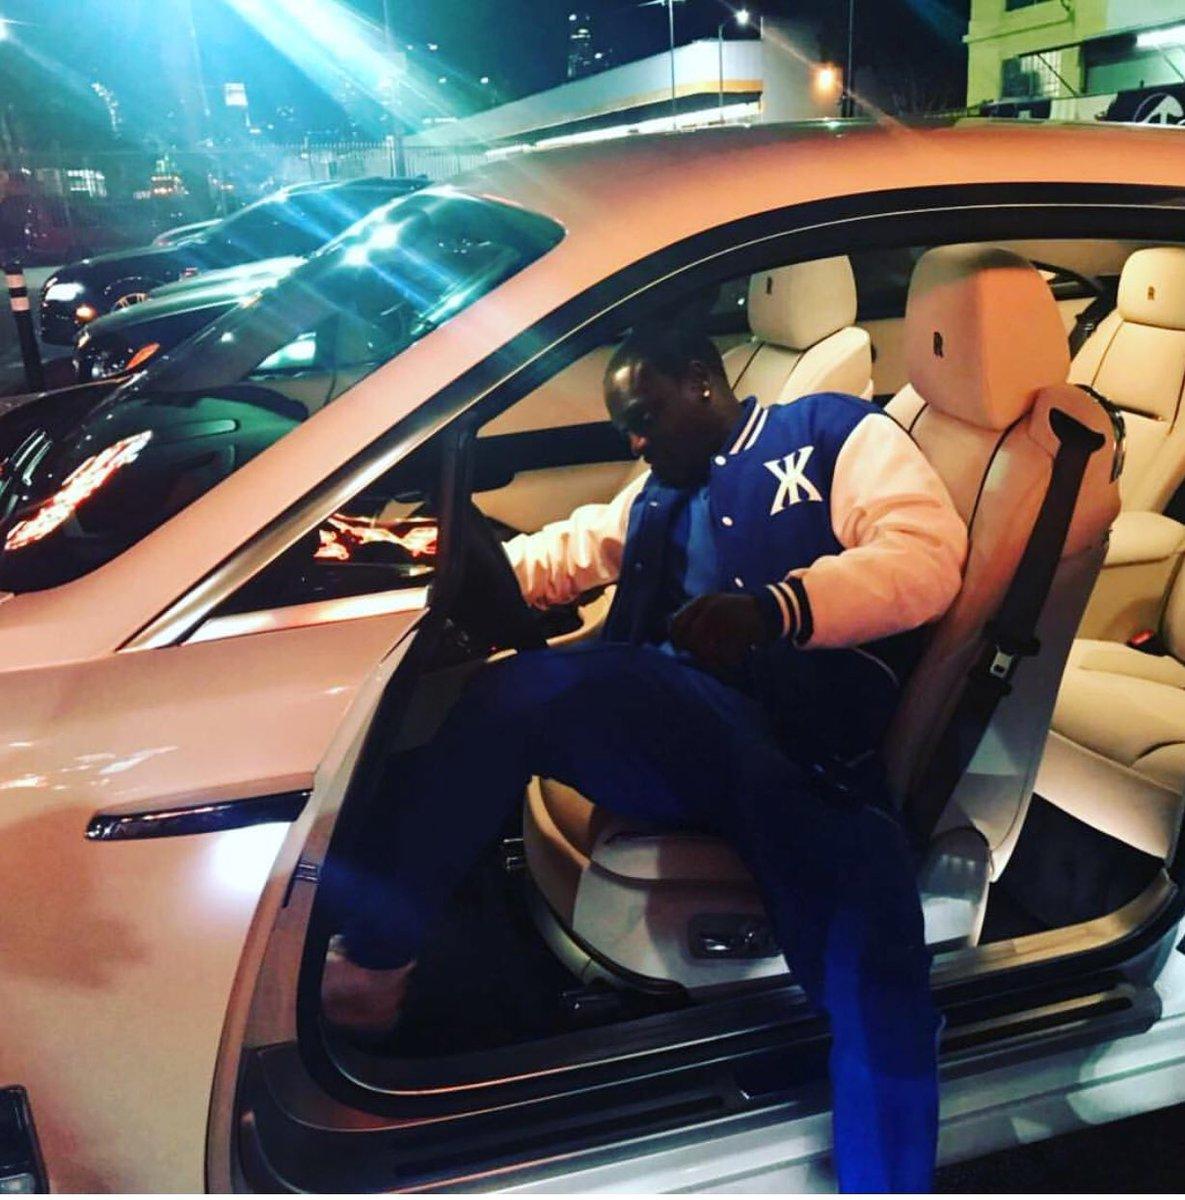 akon biography Akon biography alioune badara akon thiam, born april 16, 1977 in saint louis, missouri, united states, known simply as akon, is a senegalese-american r&b singer-songwriter, record producer.